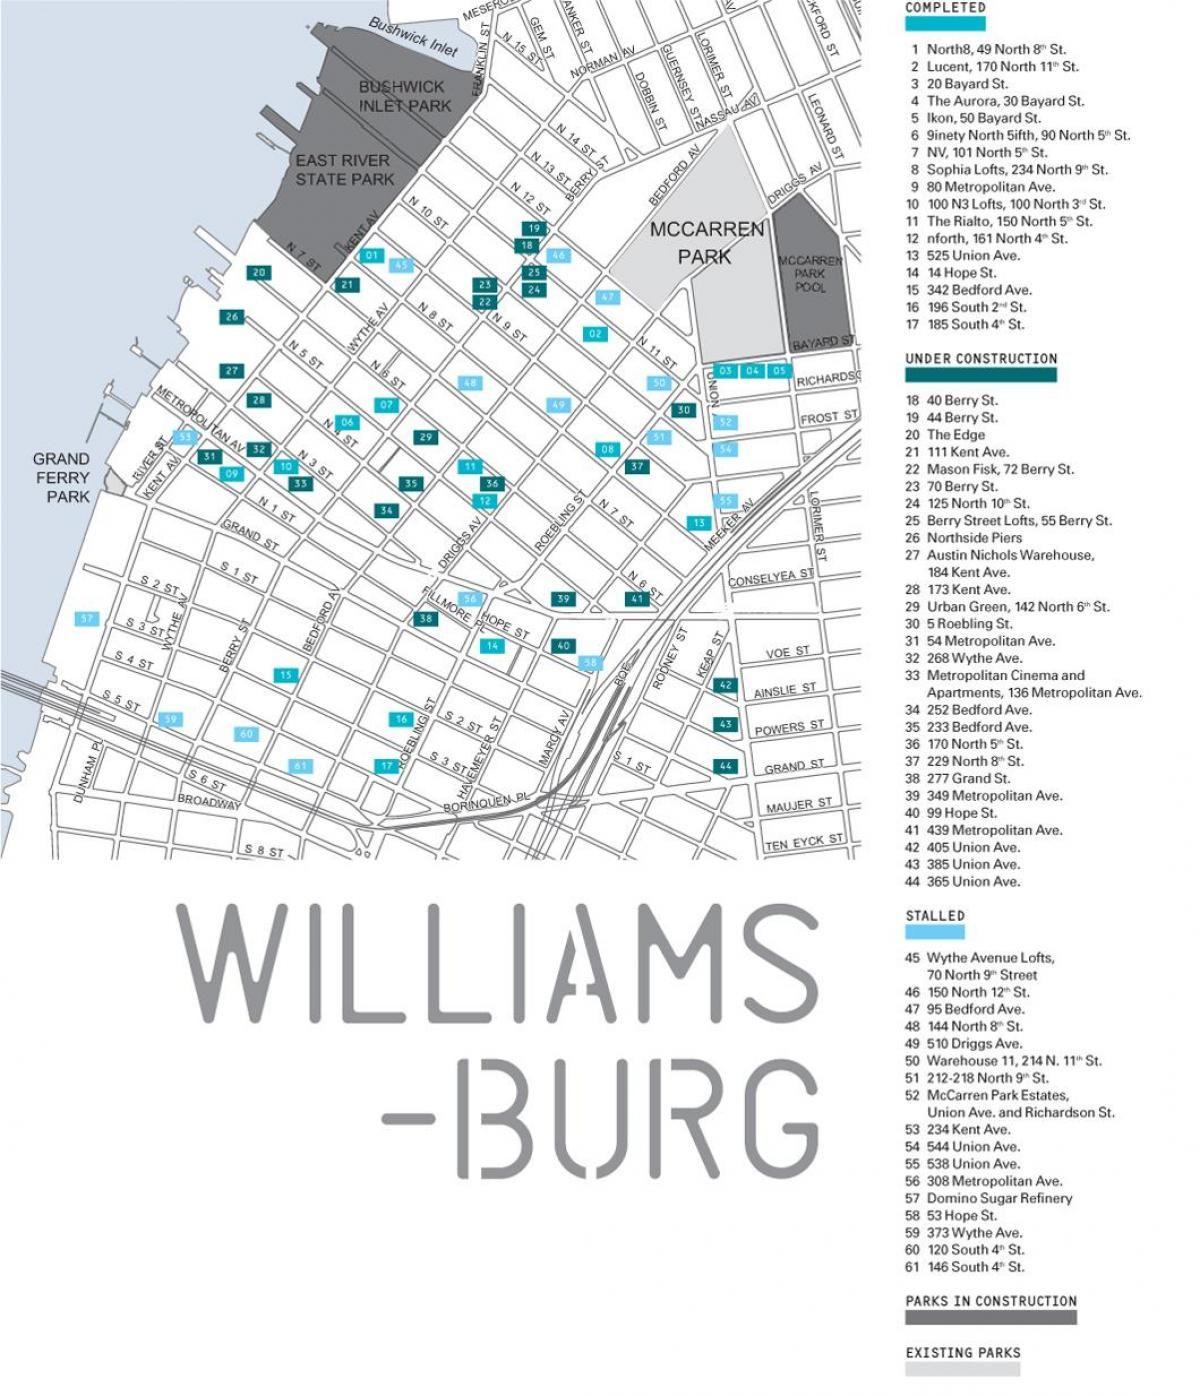 map of williamsburg brooklyn ny Williamsburg Brooklyn Map Map Of Williamsburg Brooklyn Ny New map of williamsburg brooklyn ny